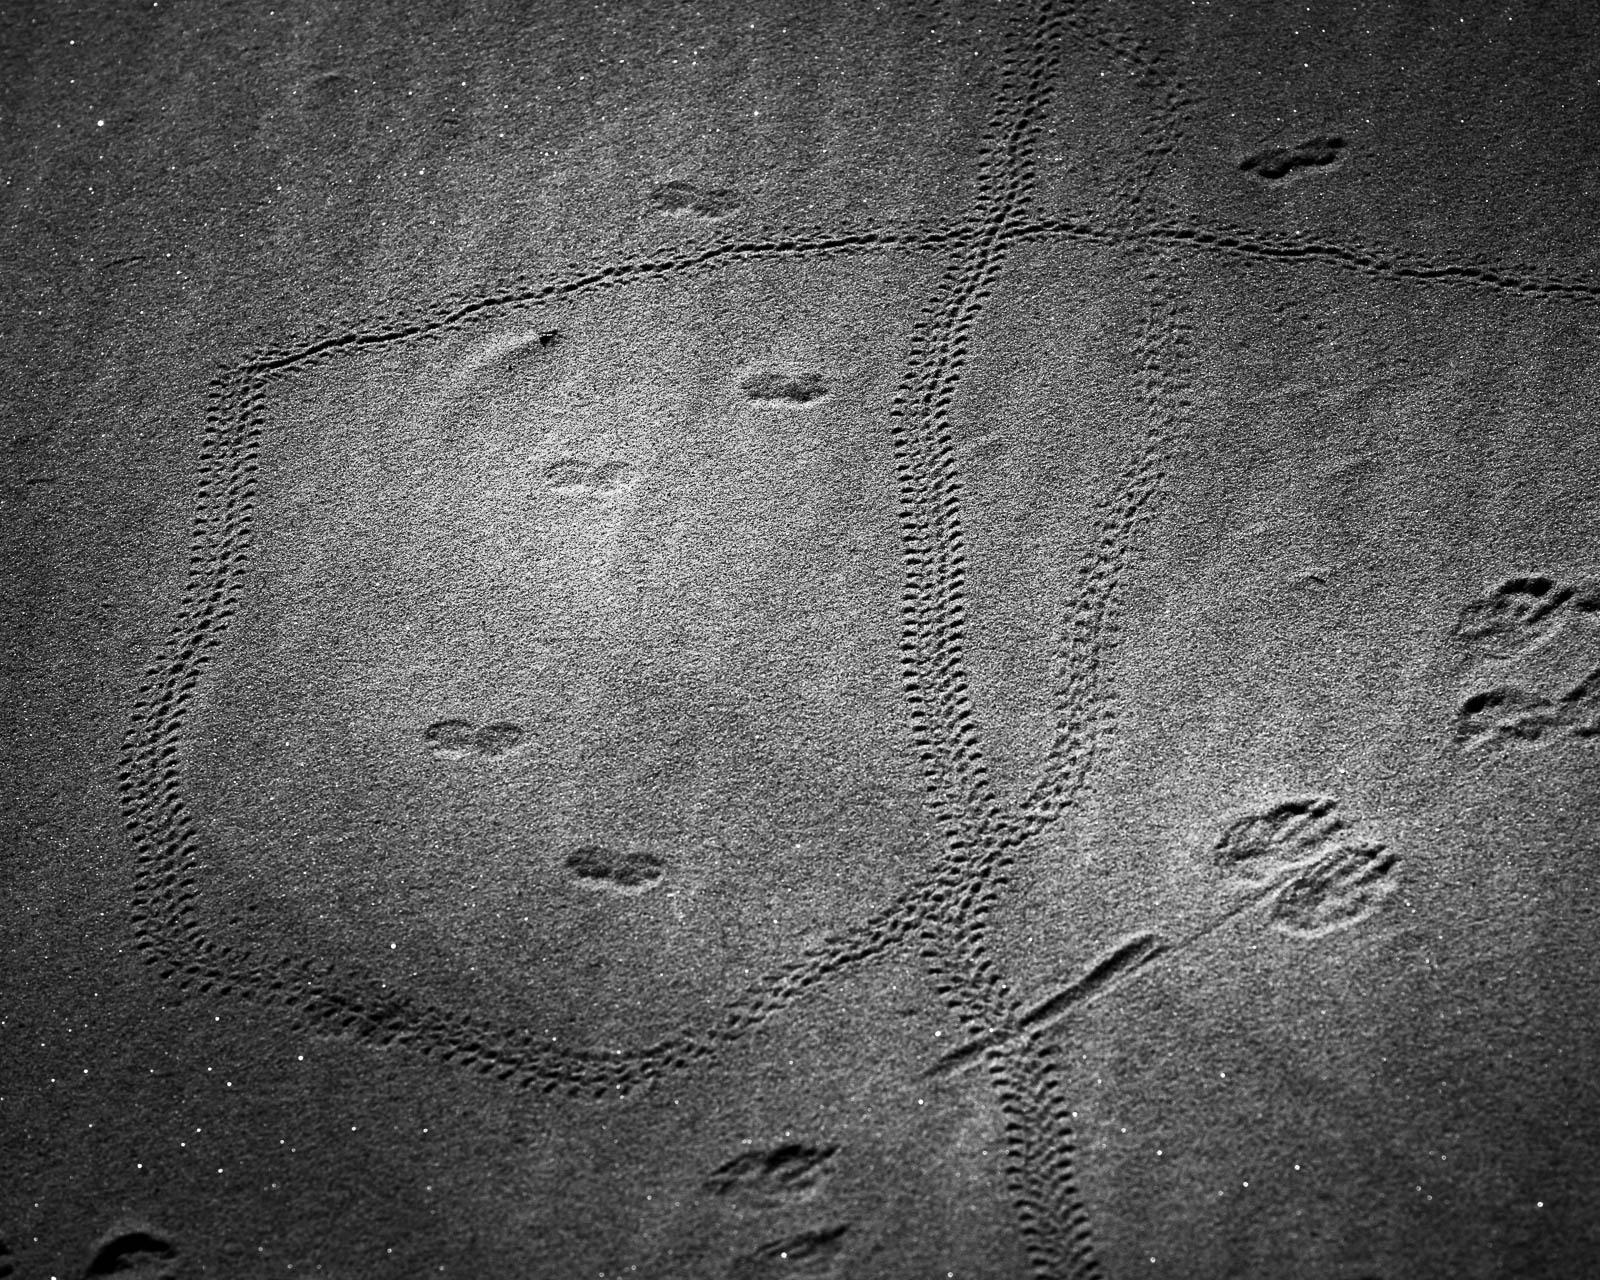 Animal, Nature, black and white, dunes, footprints, sand